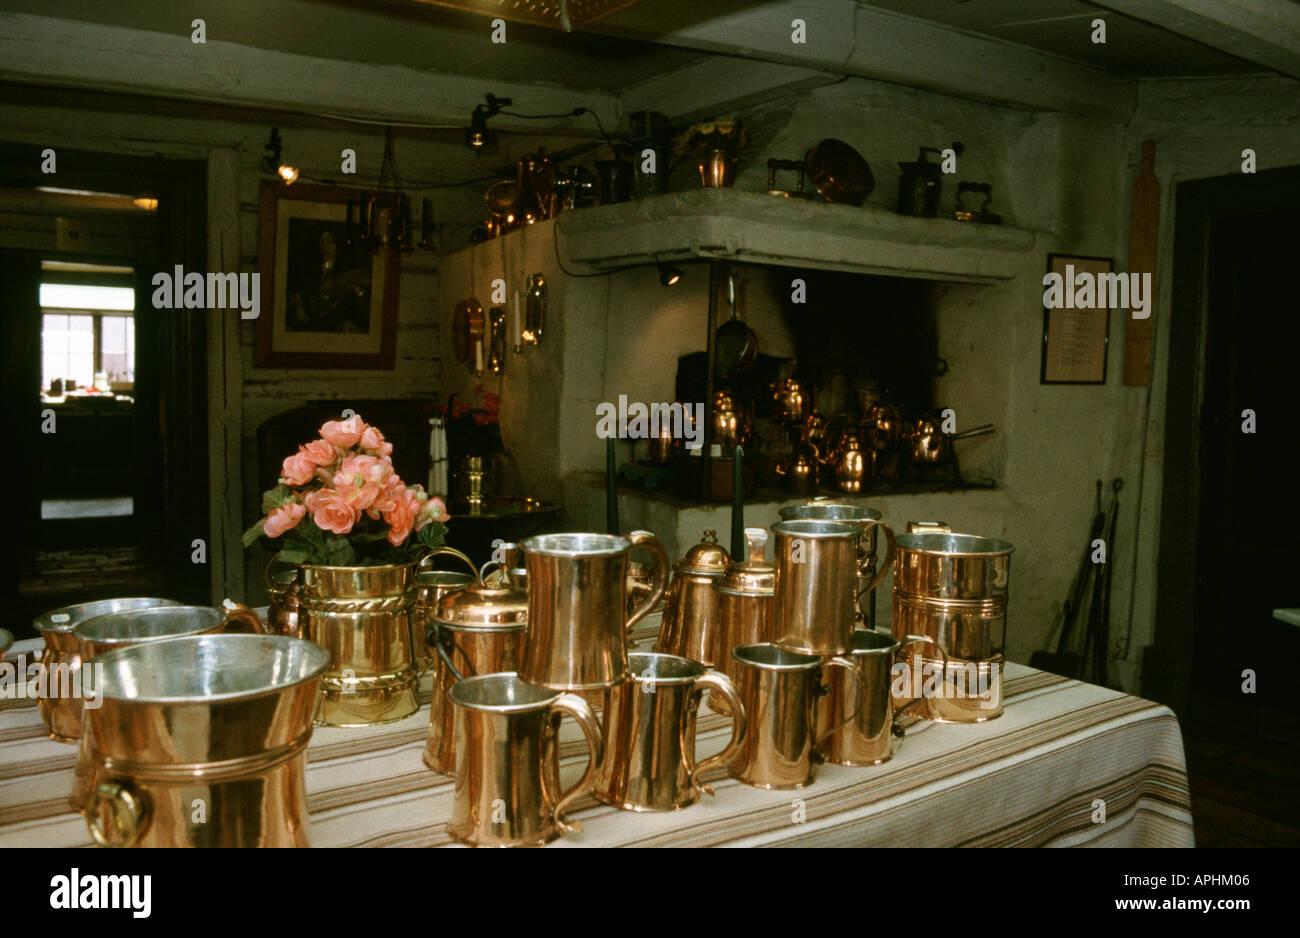 Copper pans - Stock Image